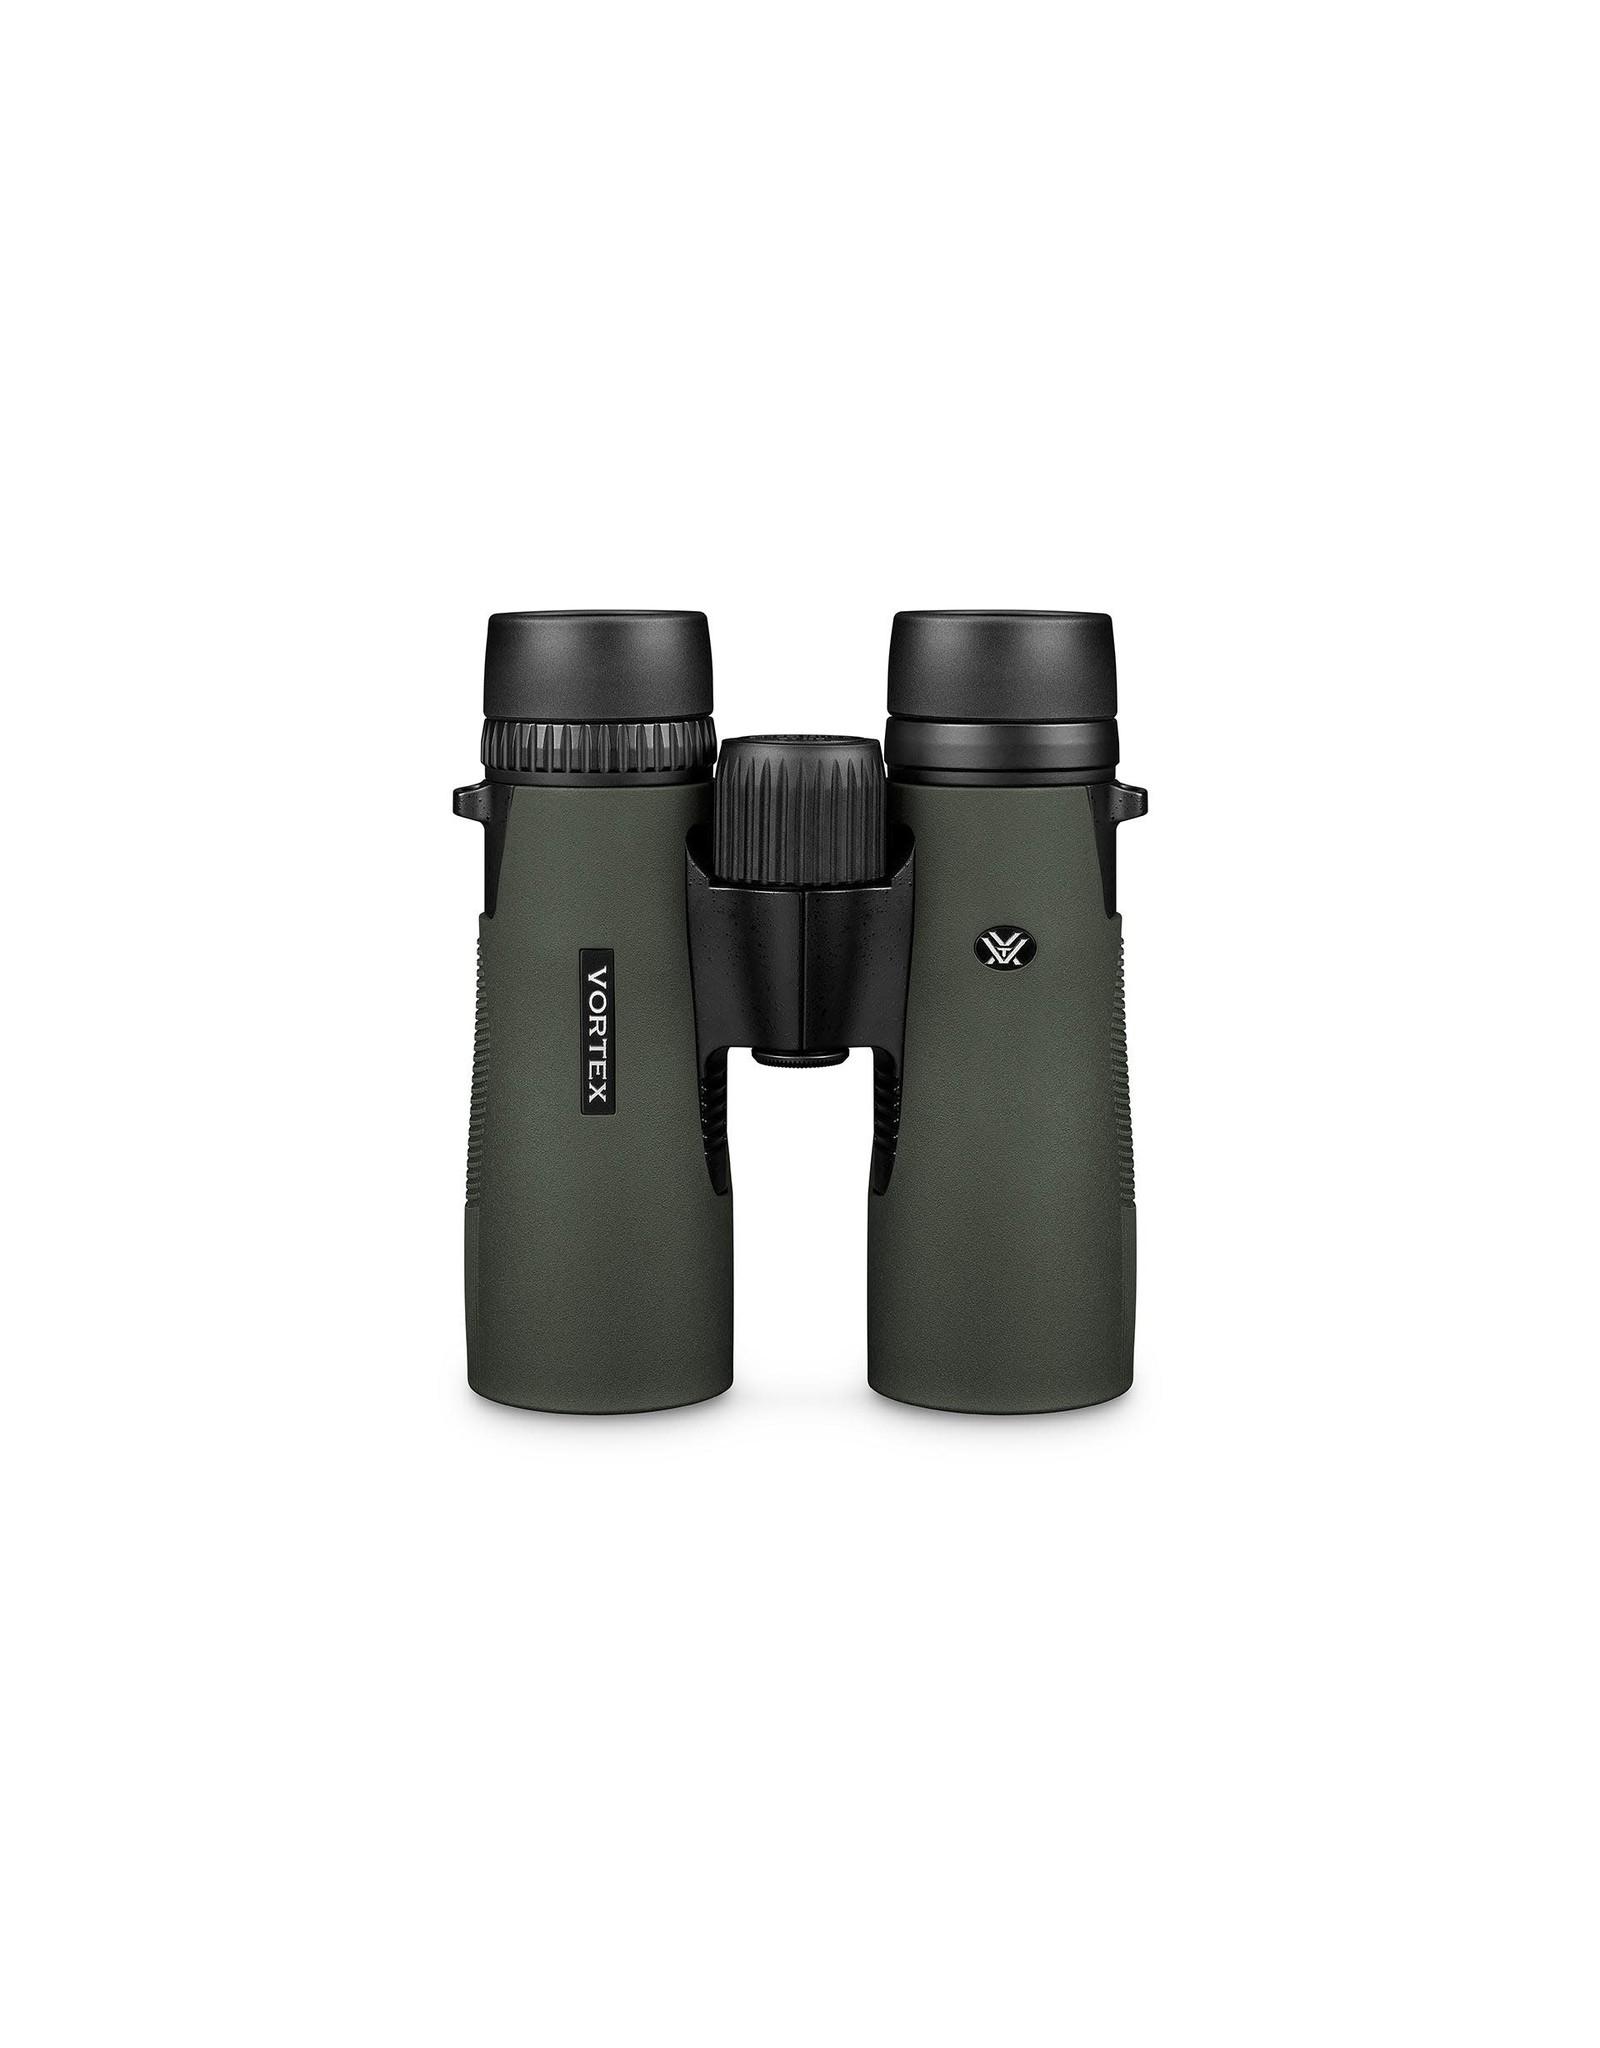 Vortex Optics VT-DB215 Vortex Diamondback HD 10x42 Binoculars